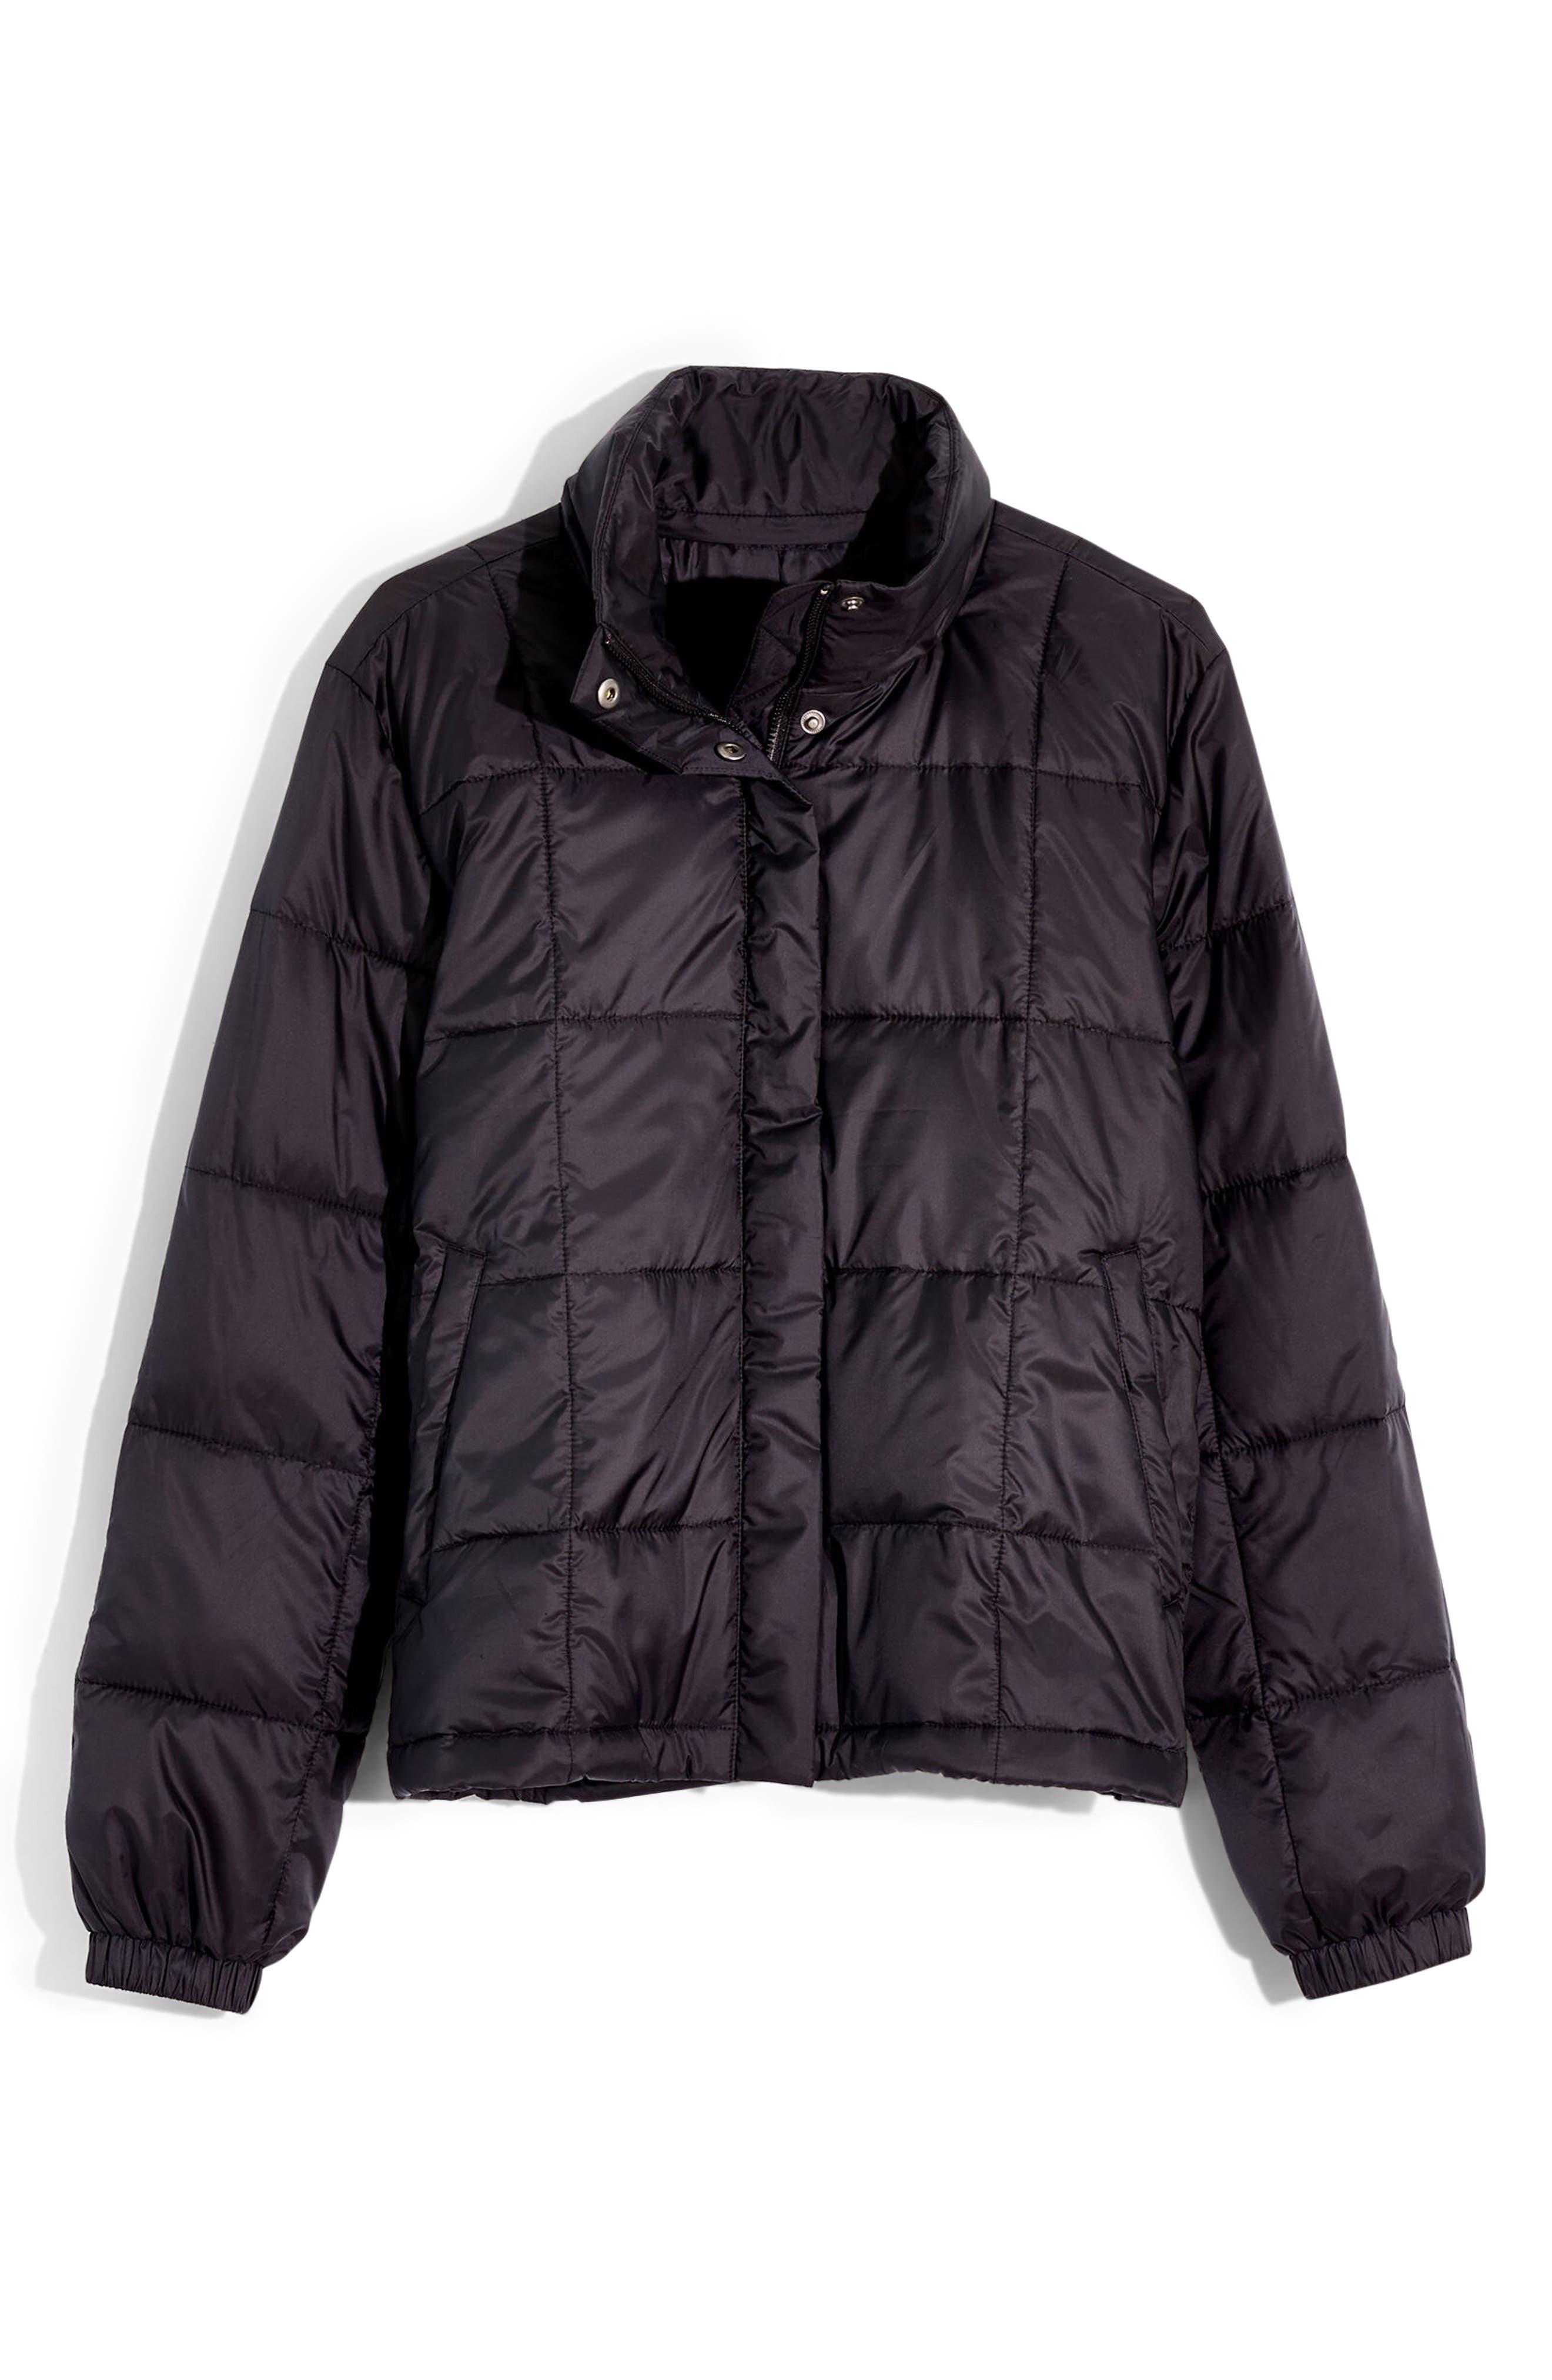 Madewell Travel Buddy Packable Puffer Jacket